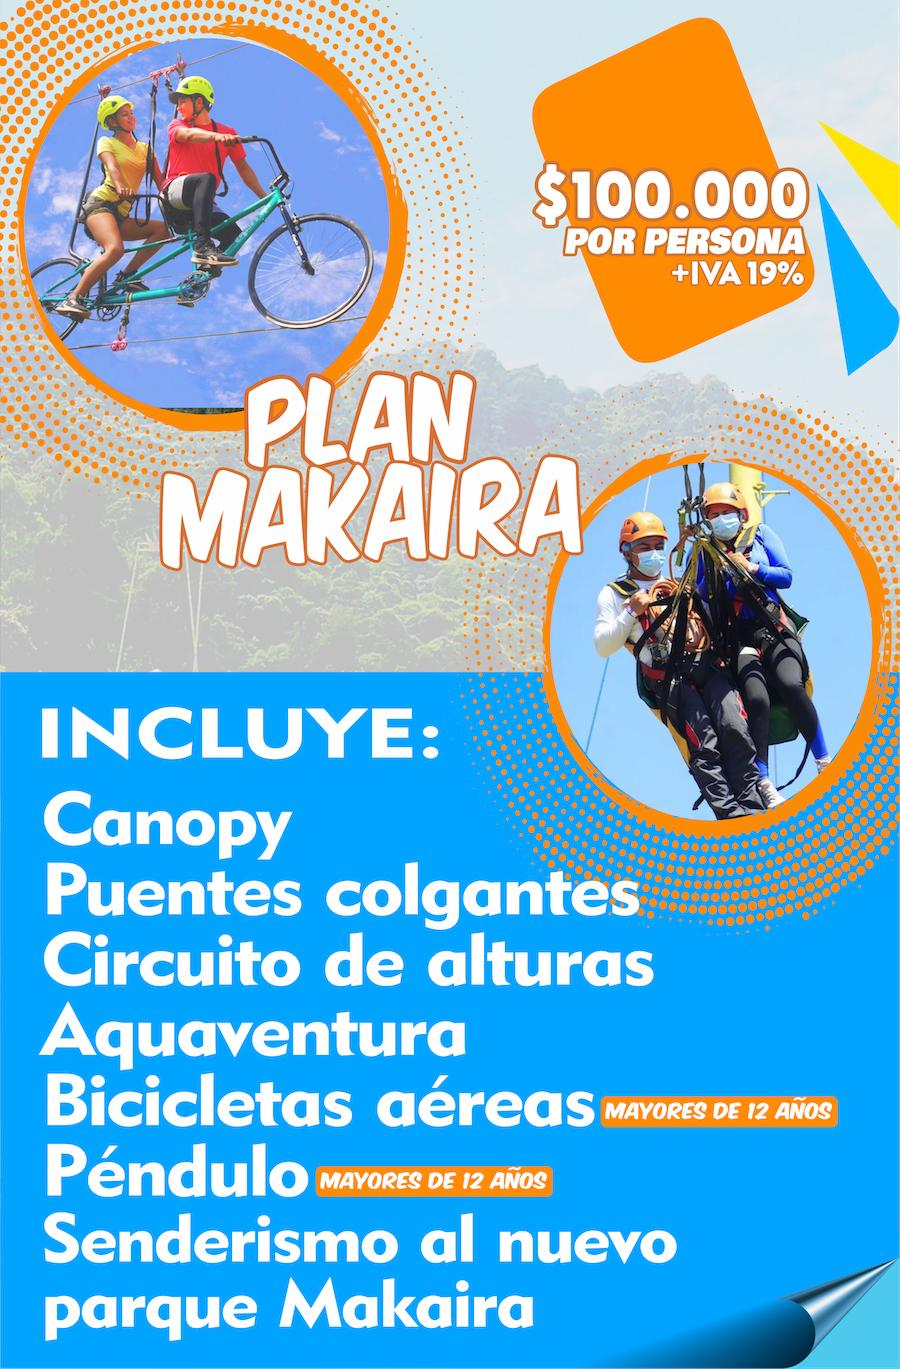 Plan Makaira